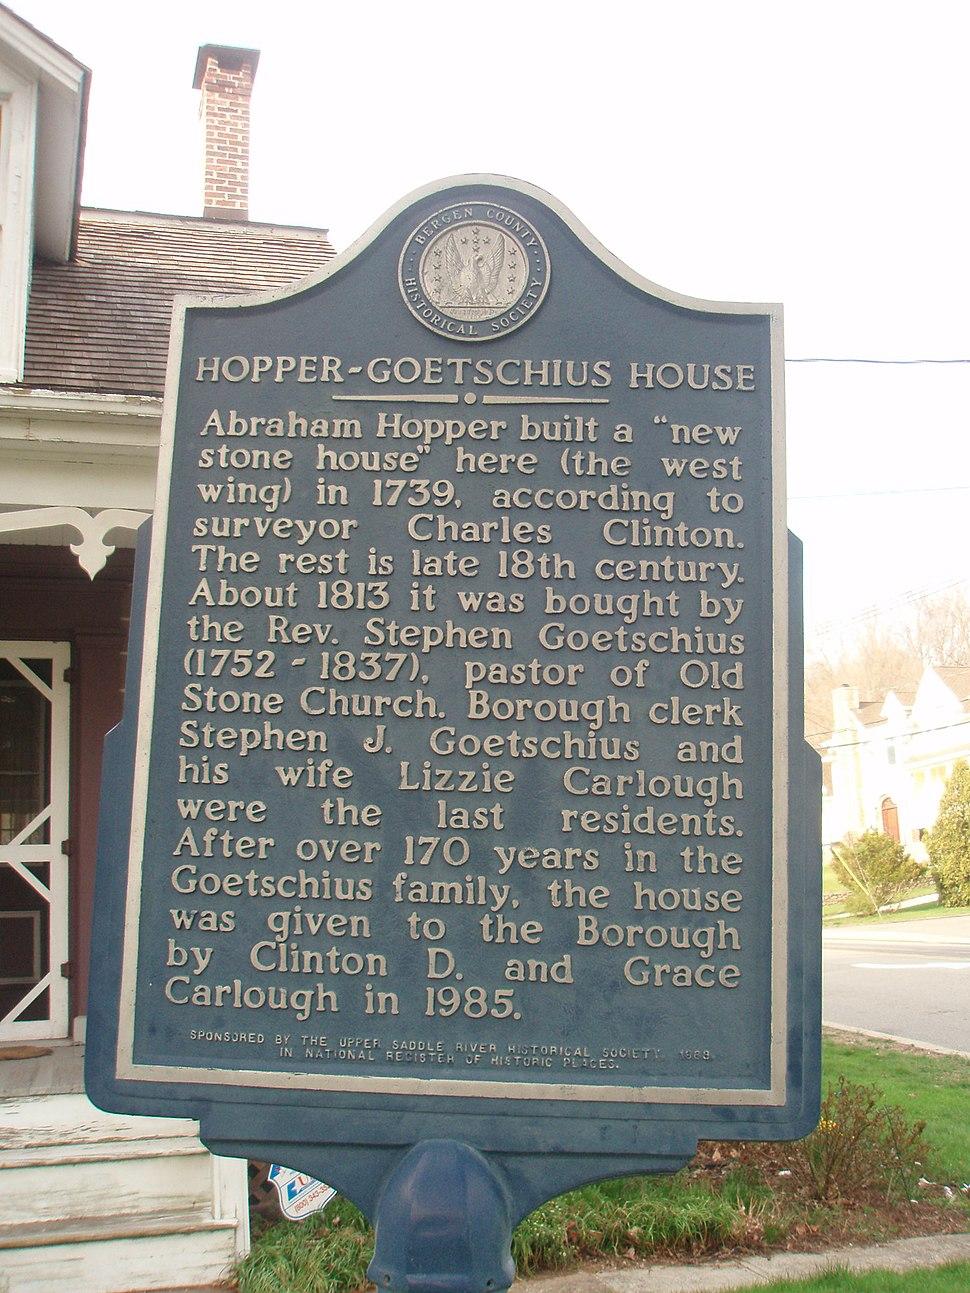 Hopper Goetschius House Marker